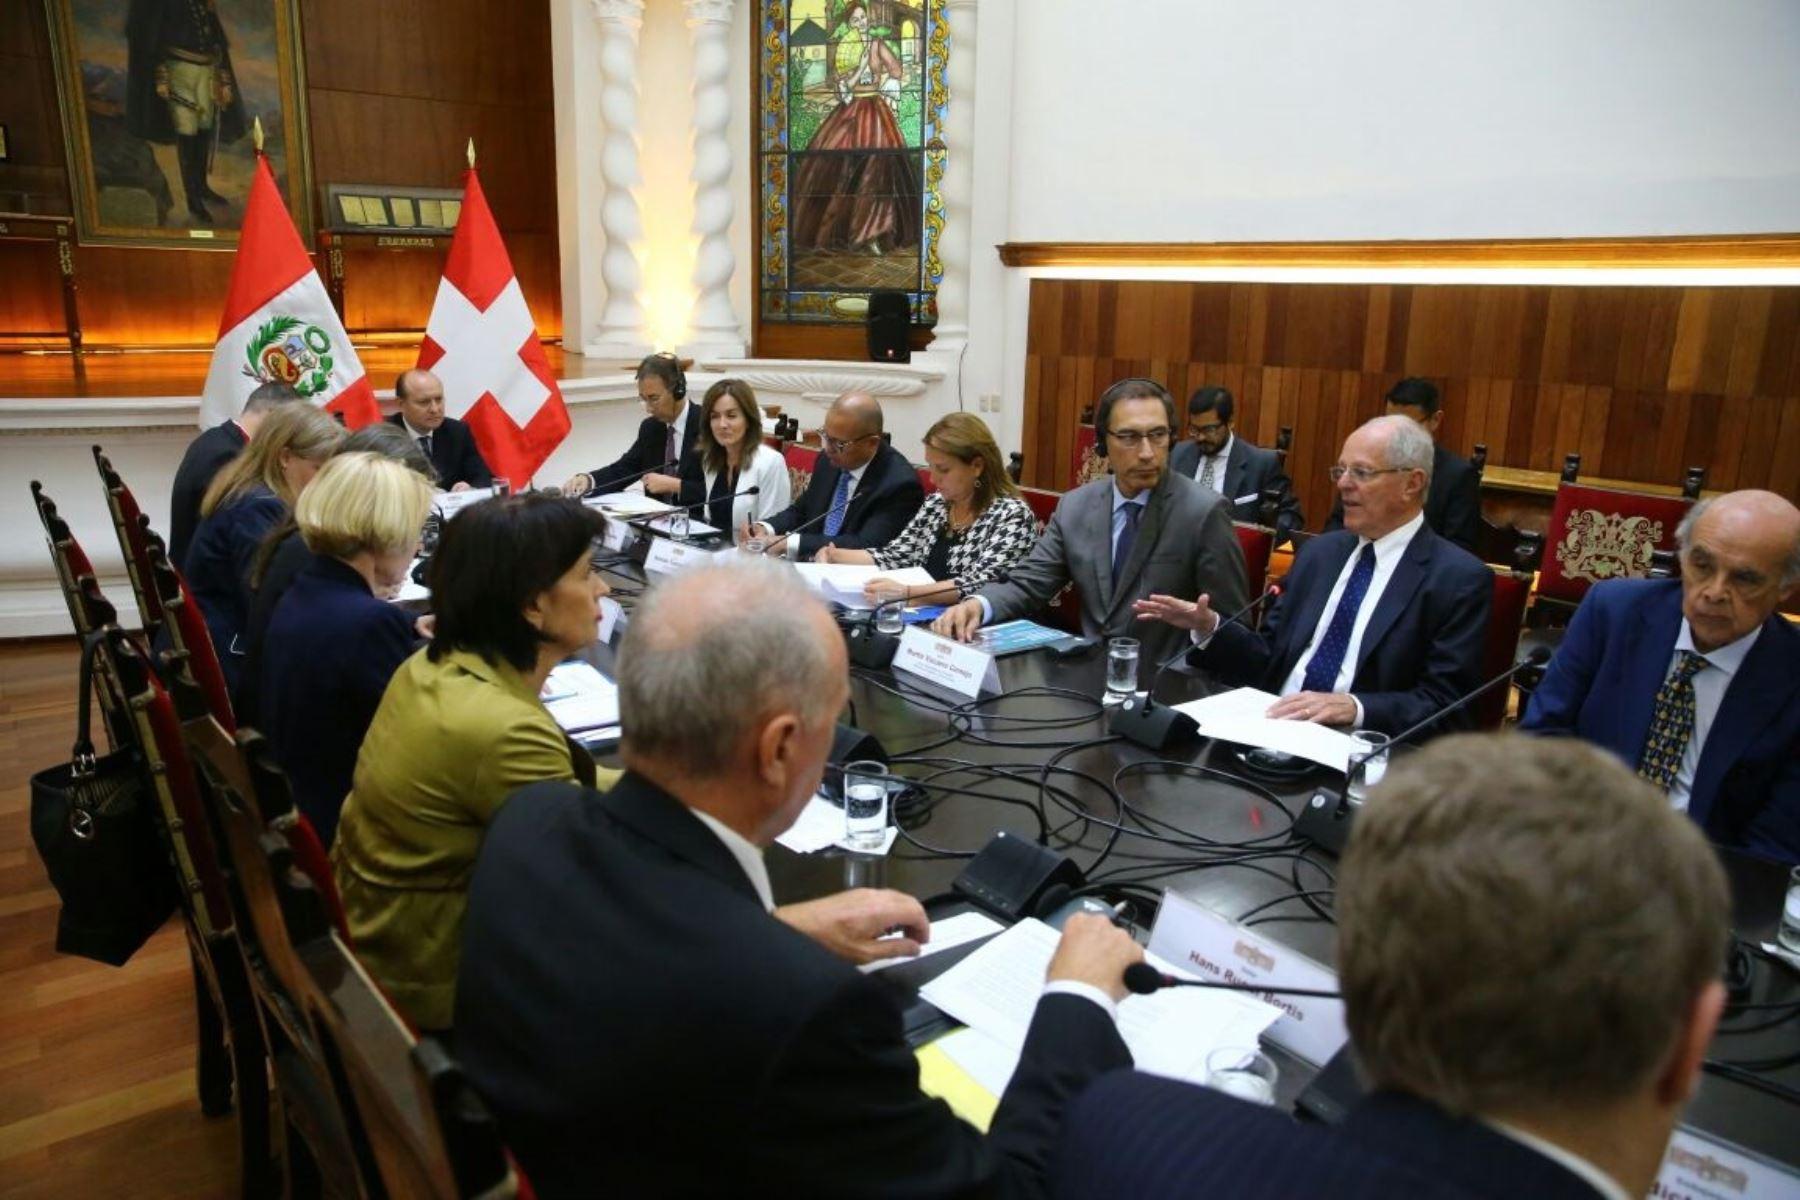 Presidente Pedro Pablo Kuczynski, se reúne con presidenta de Suiza, Doris Leuthard.